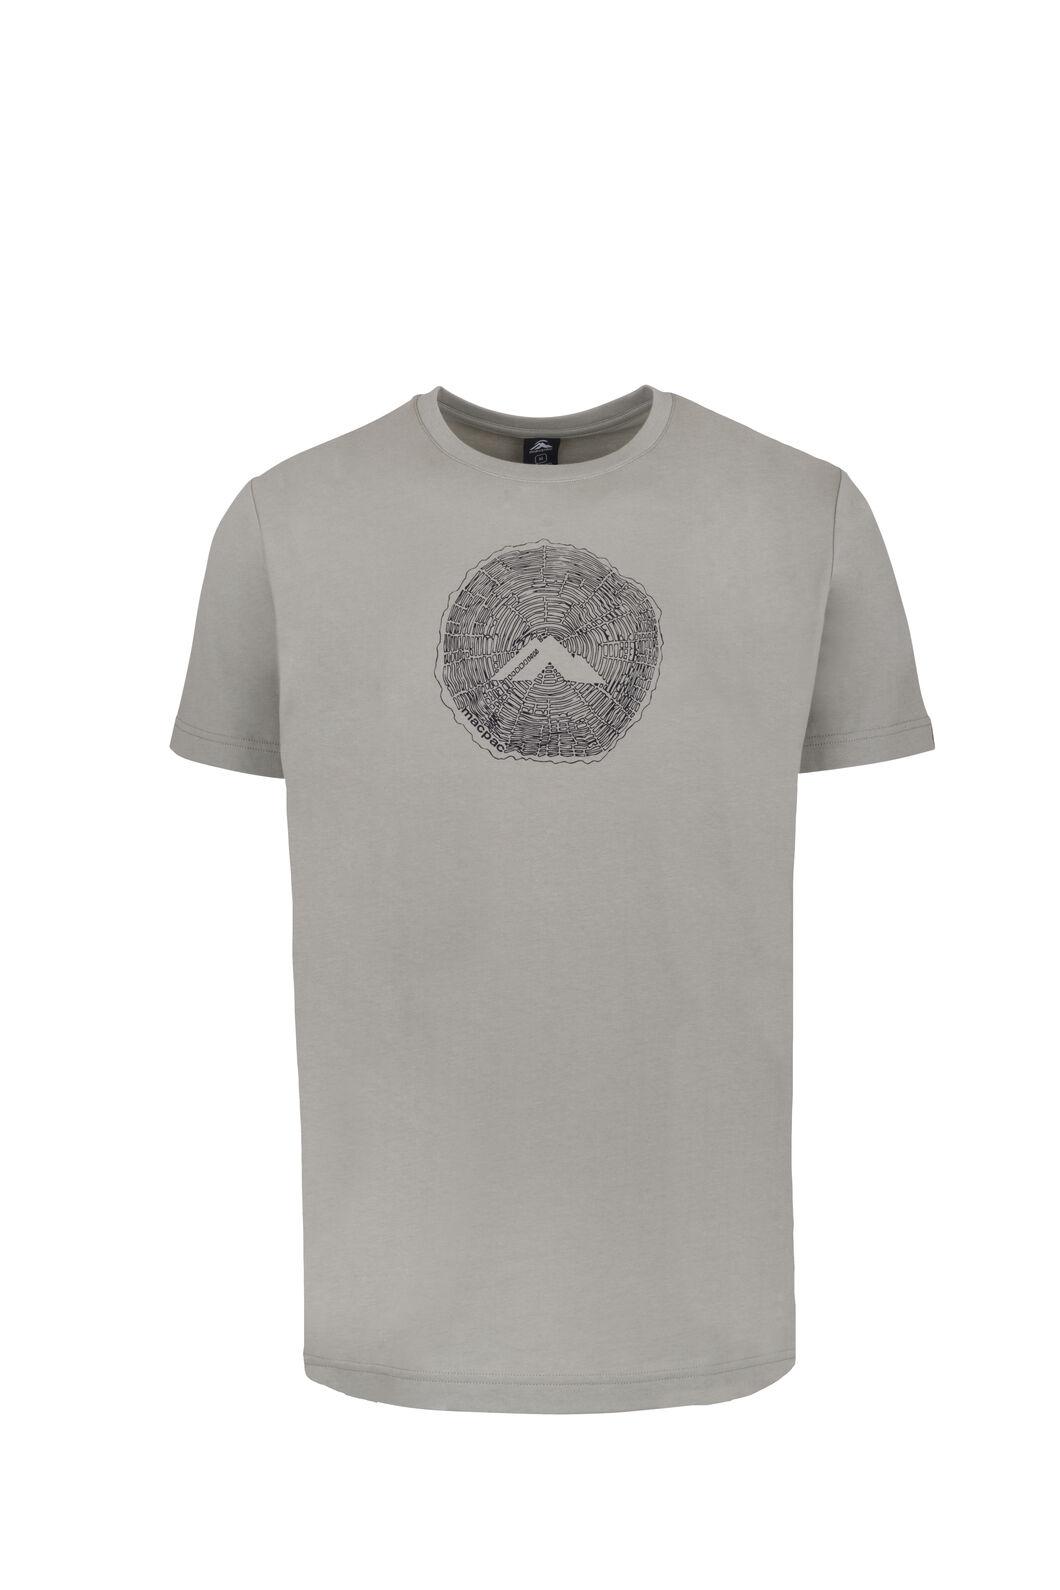 Macpac Sawcut Organic Cotton T-Shirt - Men's, Seagrass, hi-res